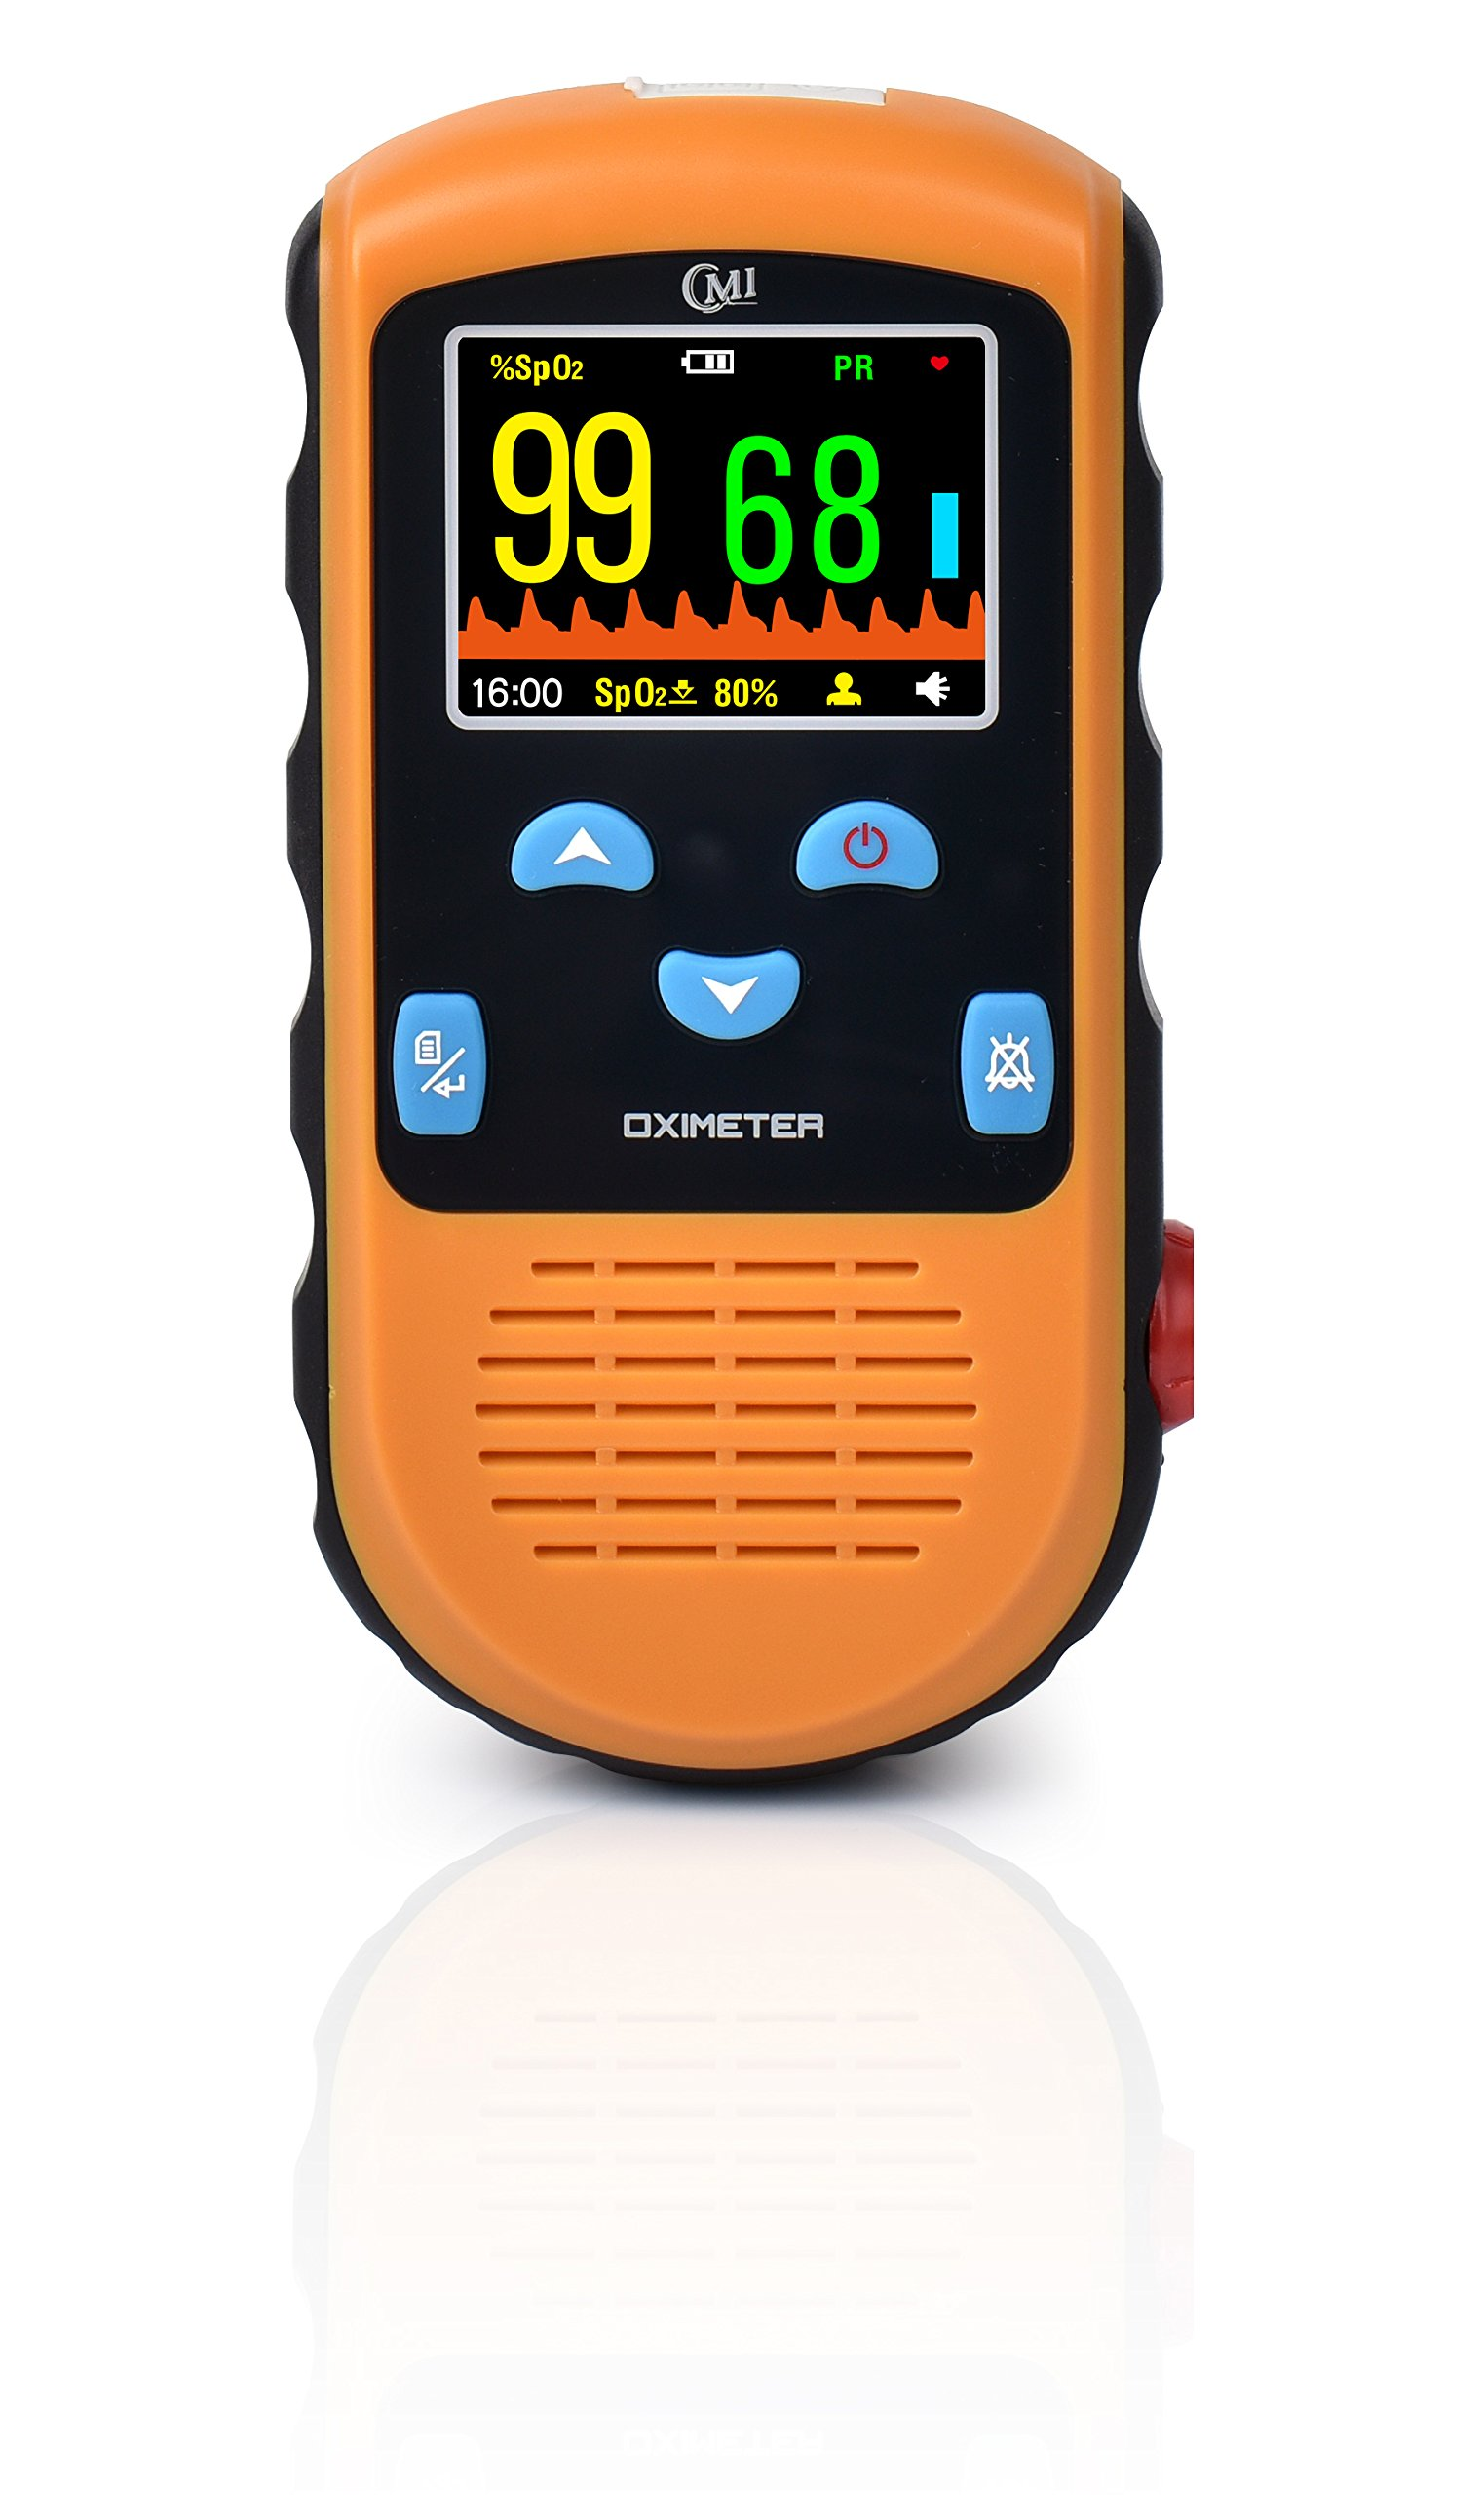 CMI Handheld Pulse Oximeter with Adult Sensor (Standard)